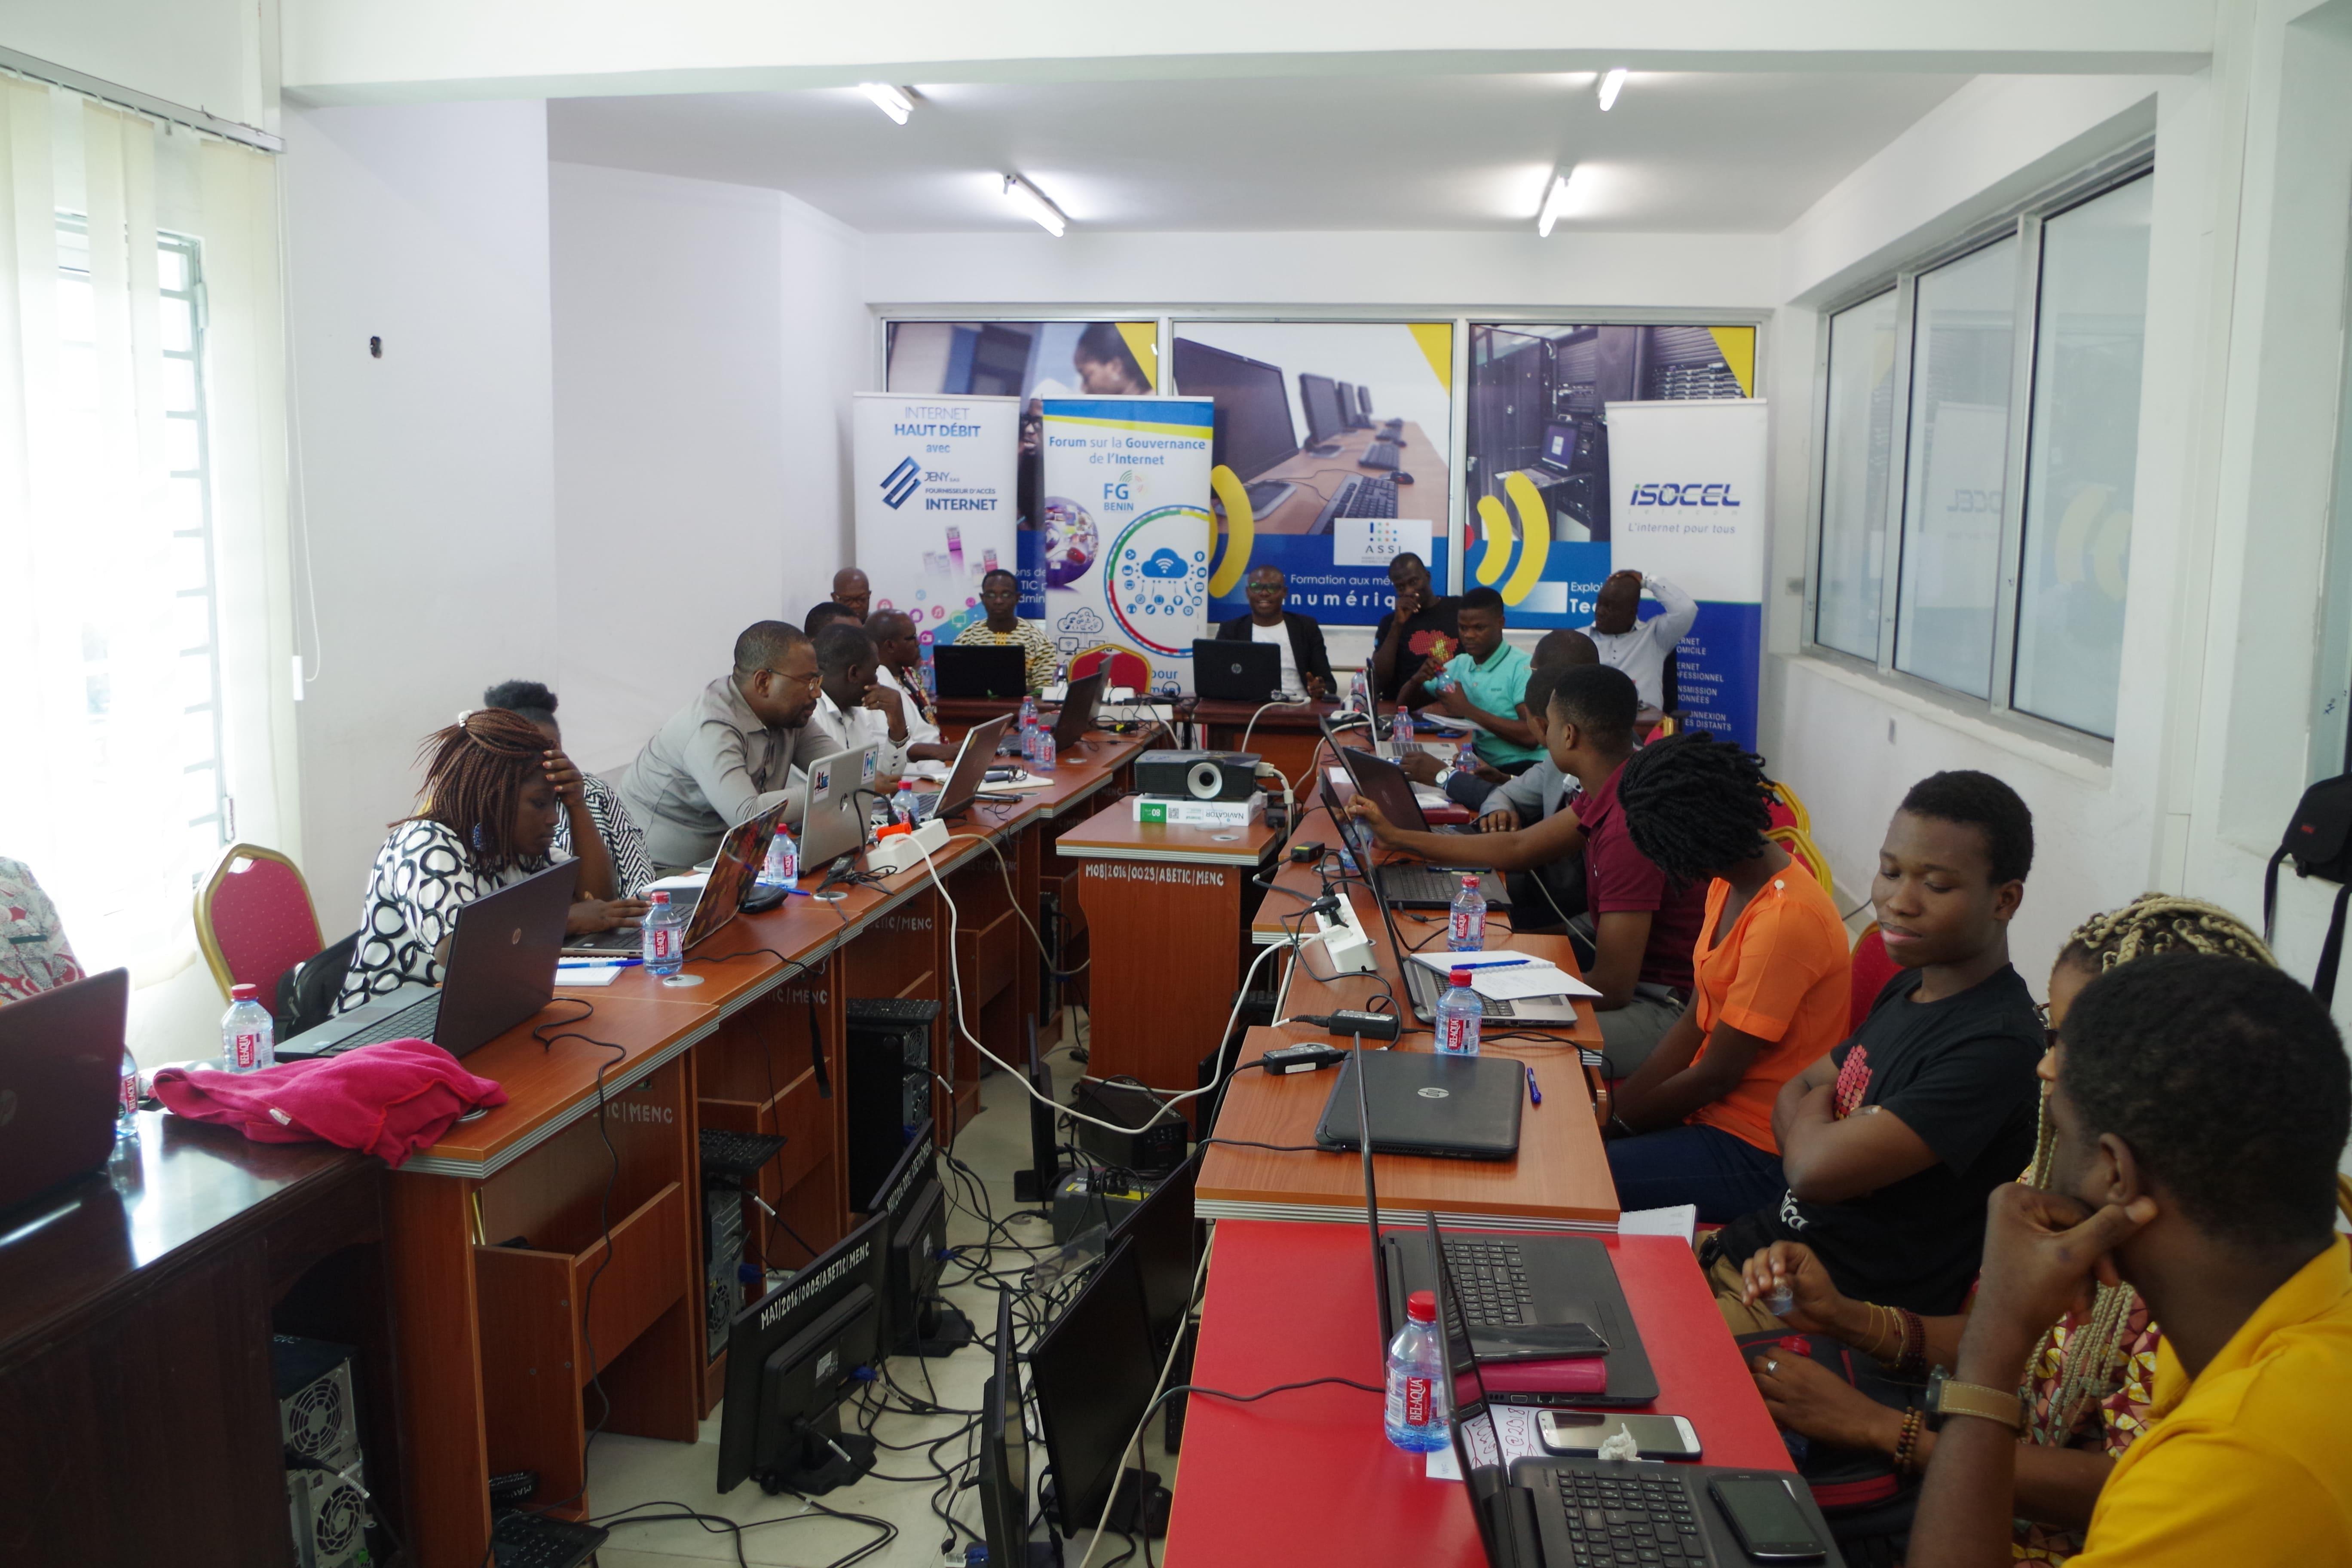 ecole gouvernance internet 2018